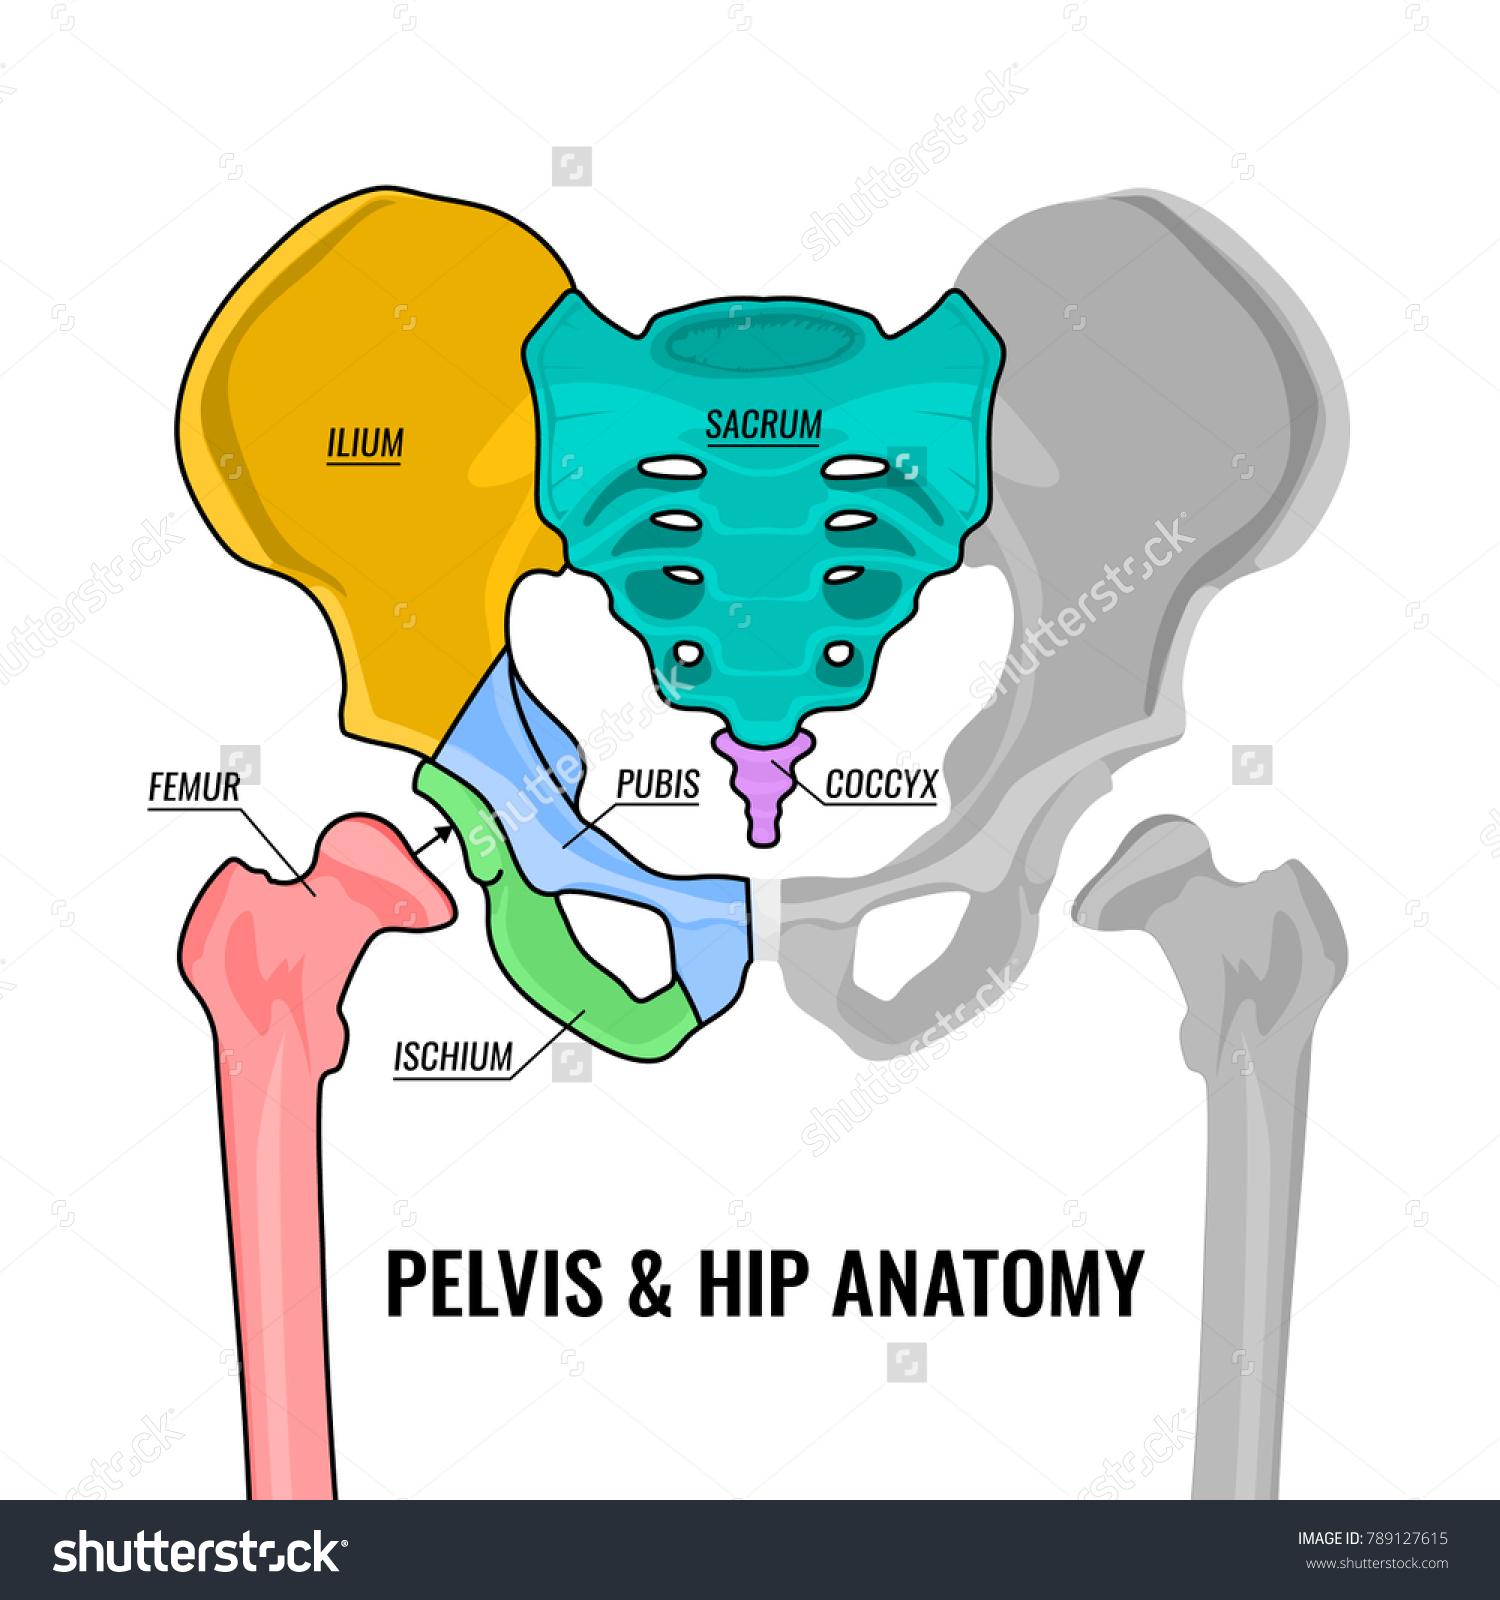 Human Male Anatomy Scheme Main Pelvis Stock Vector (Royalty Free ...